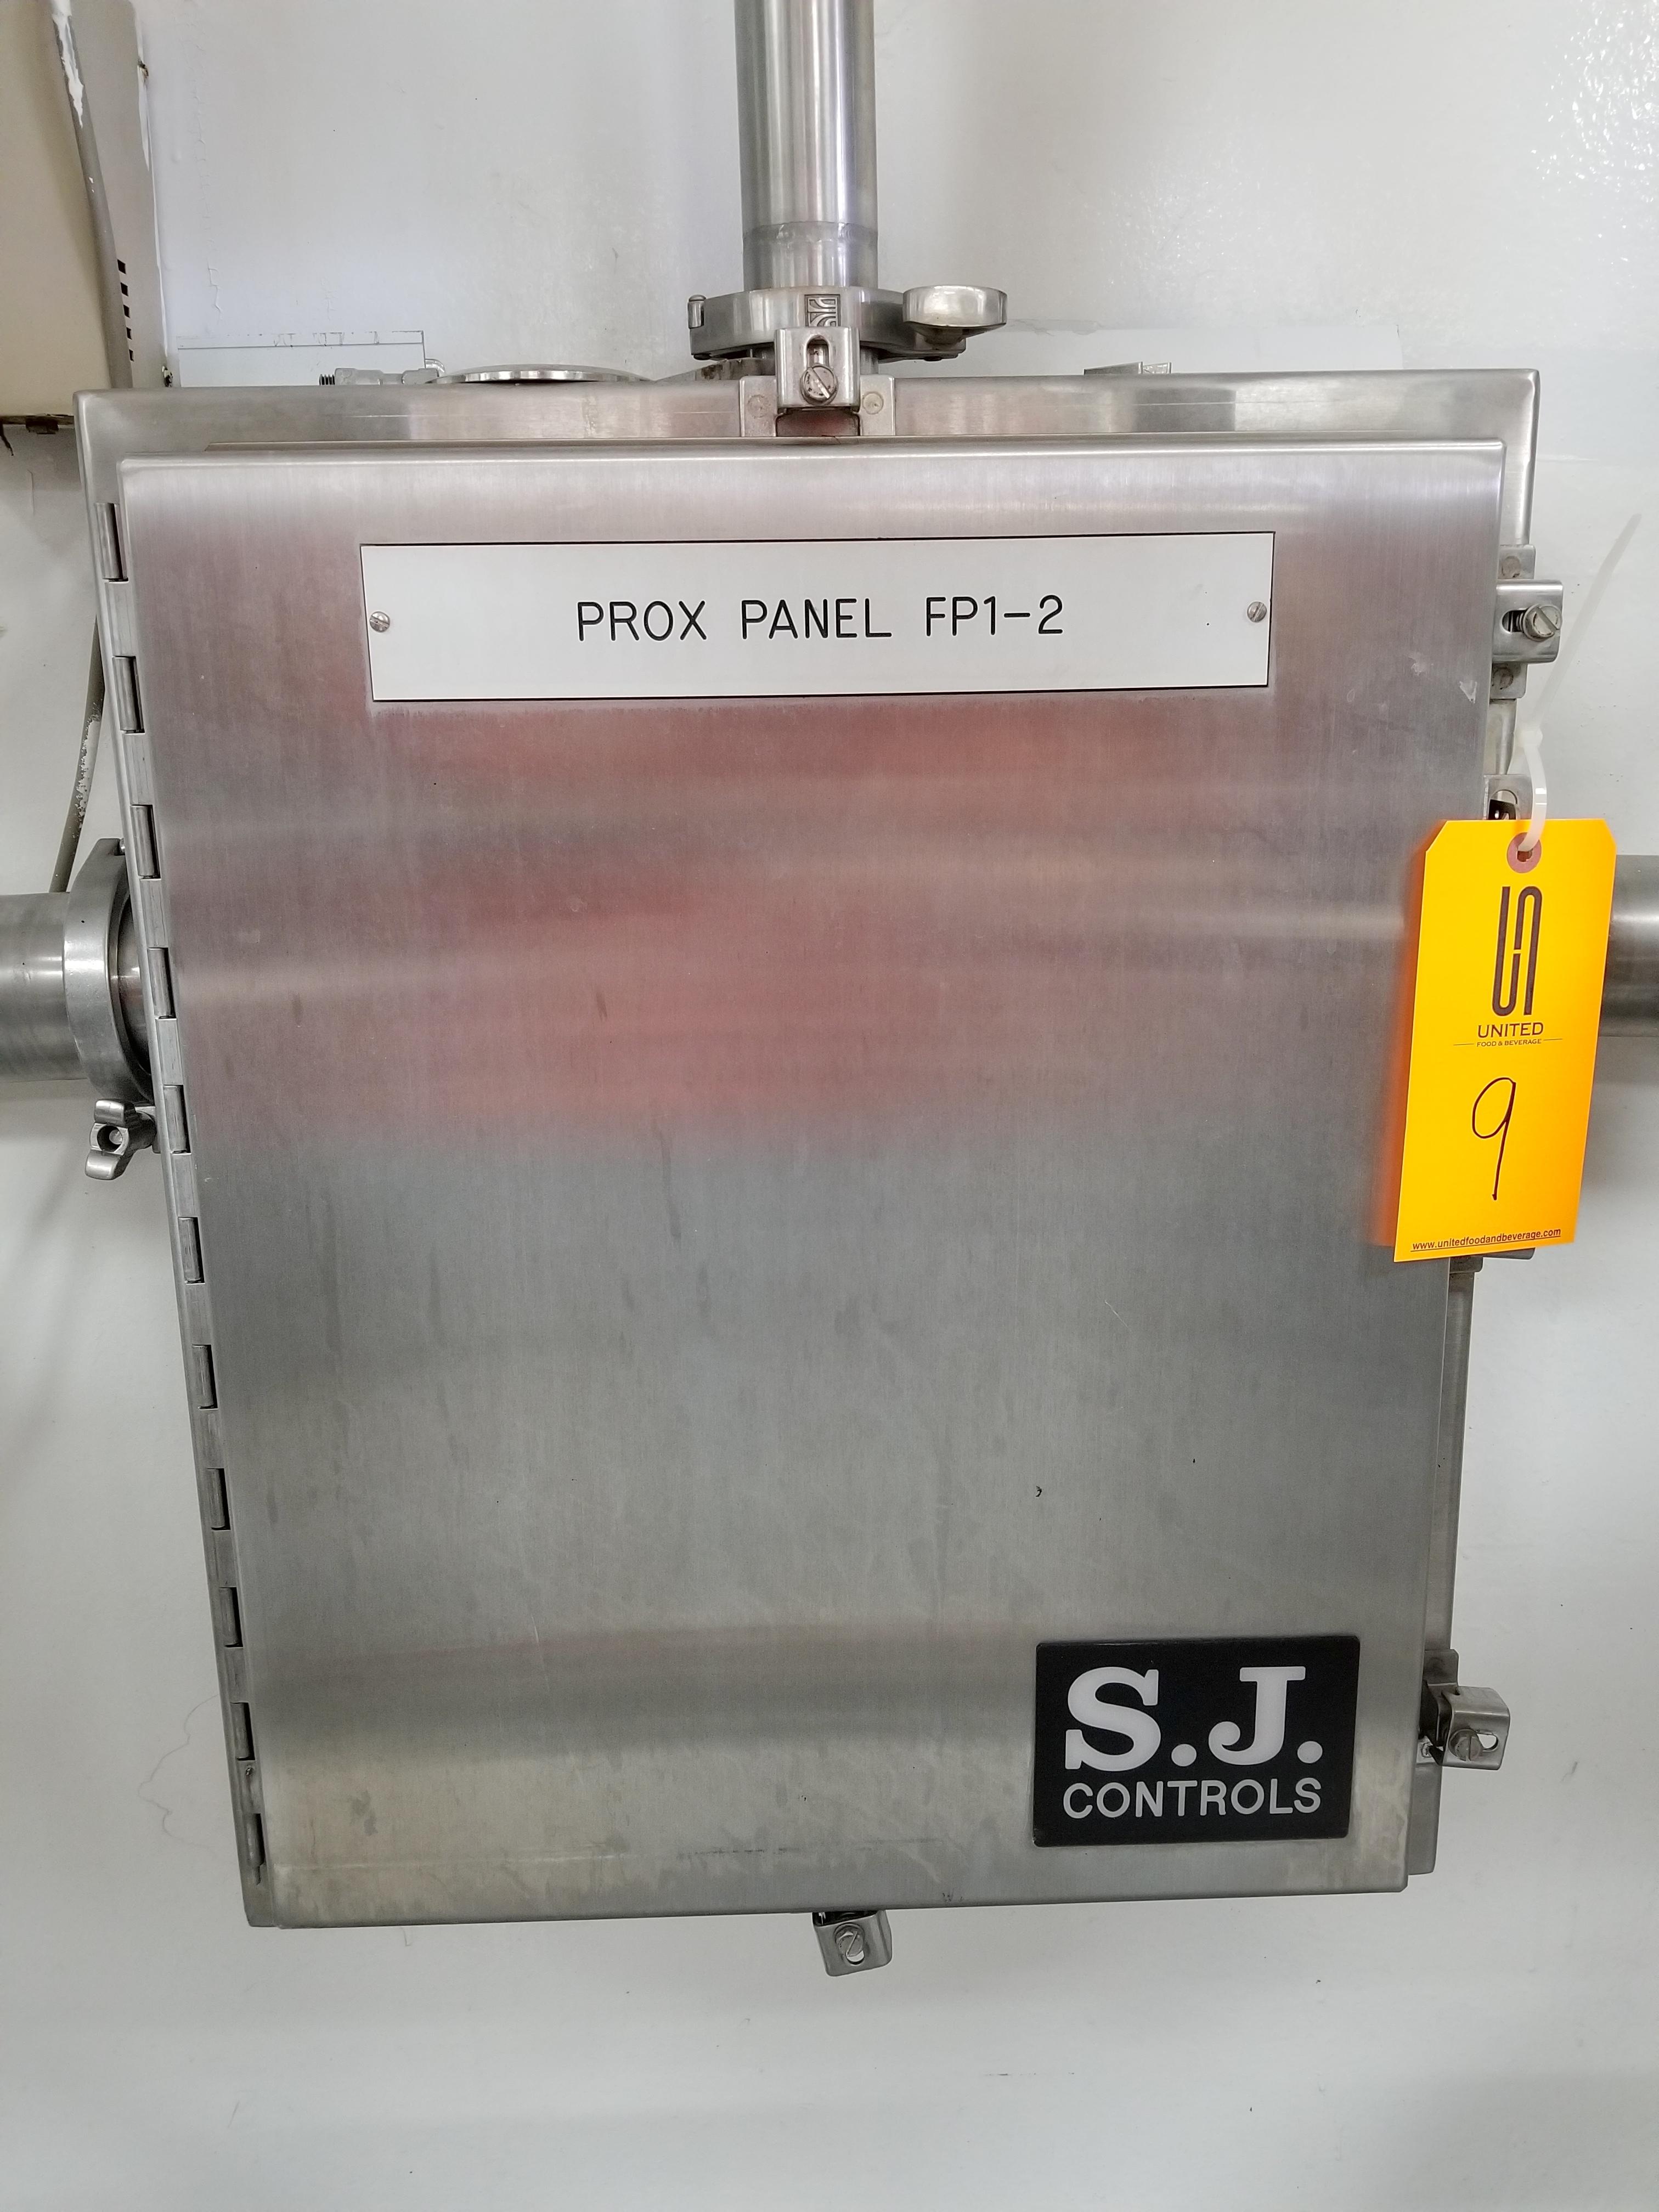 SJ Controls Stainless Steel Panel